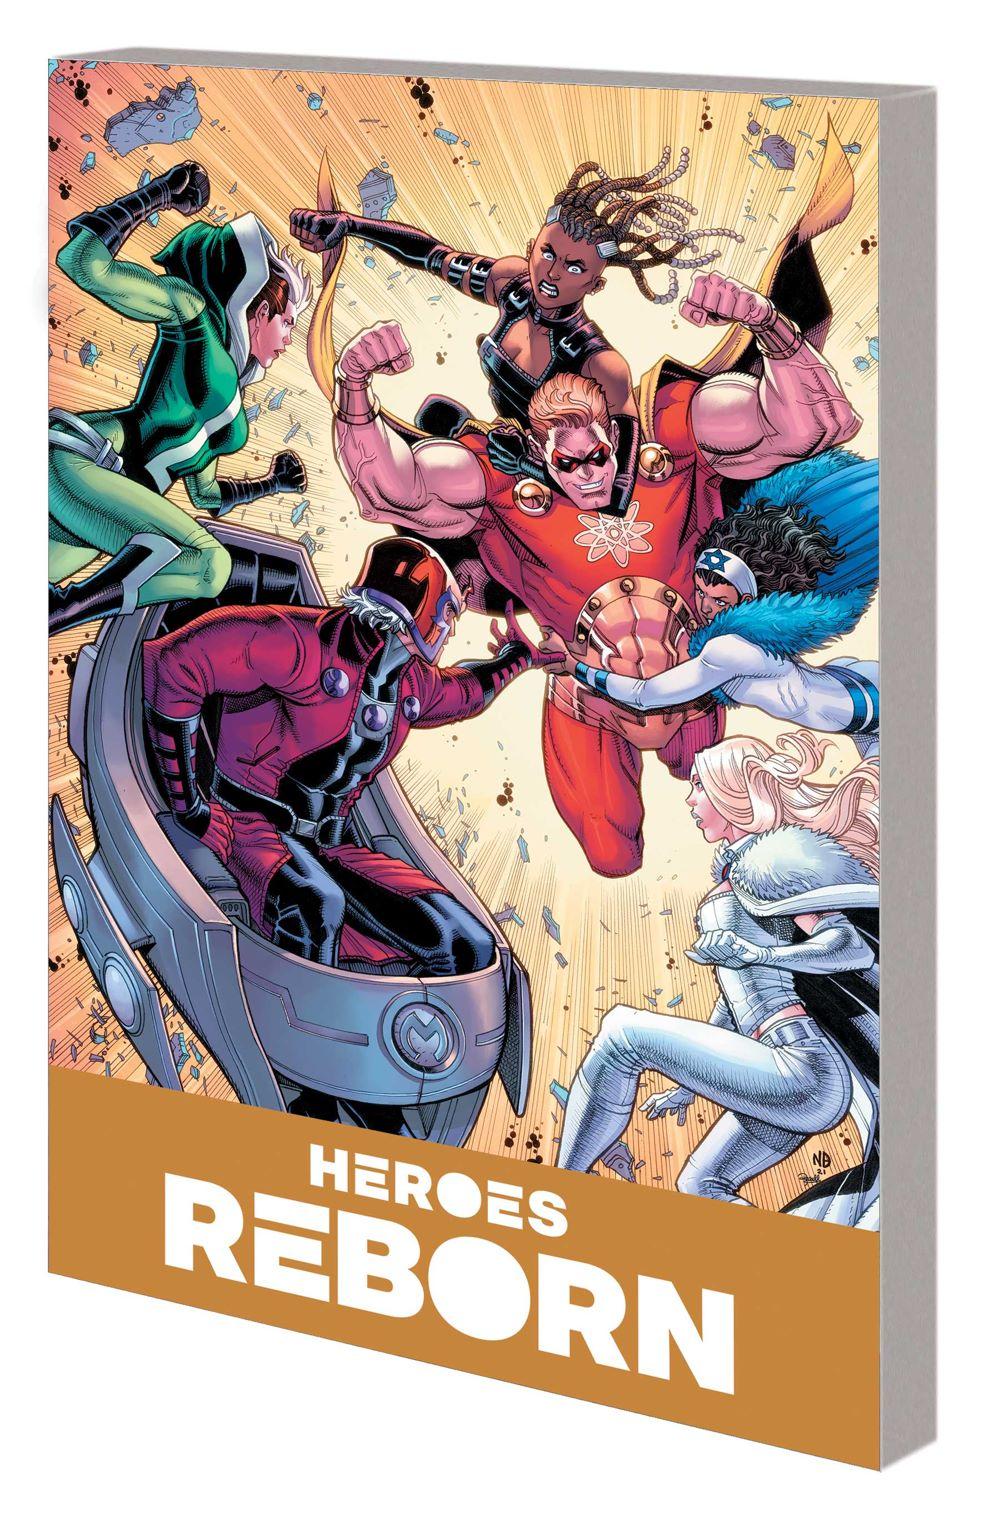 HEROES_REBORN_COMPANION_VOL_1_TPB Marvel Comics August 2021 Solicitations